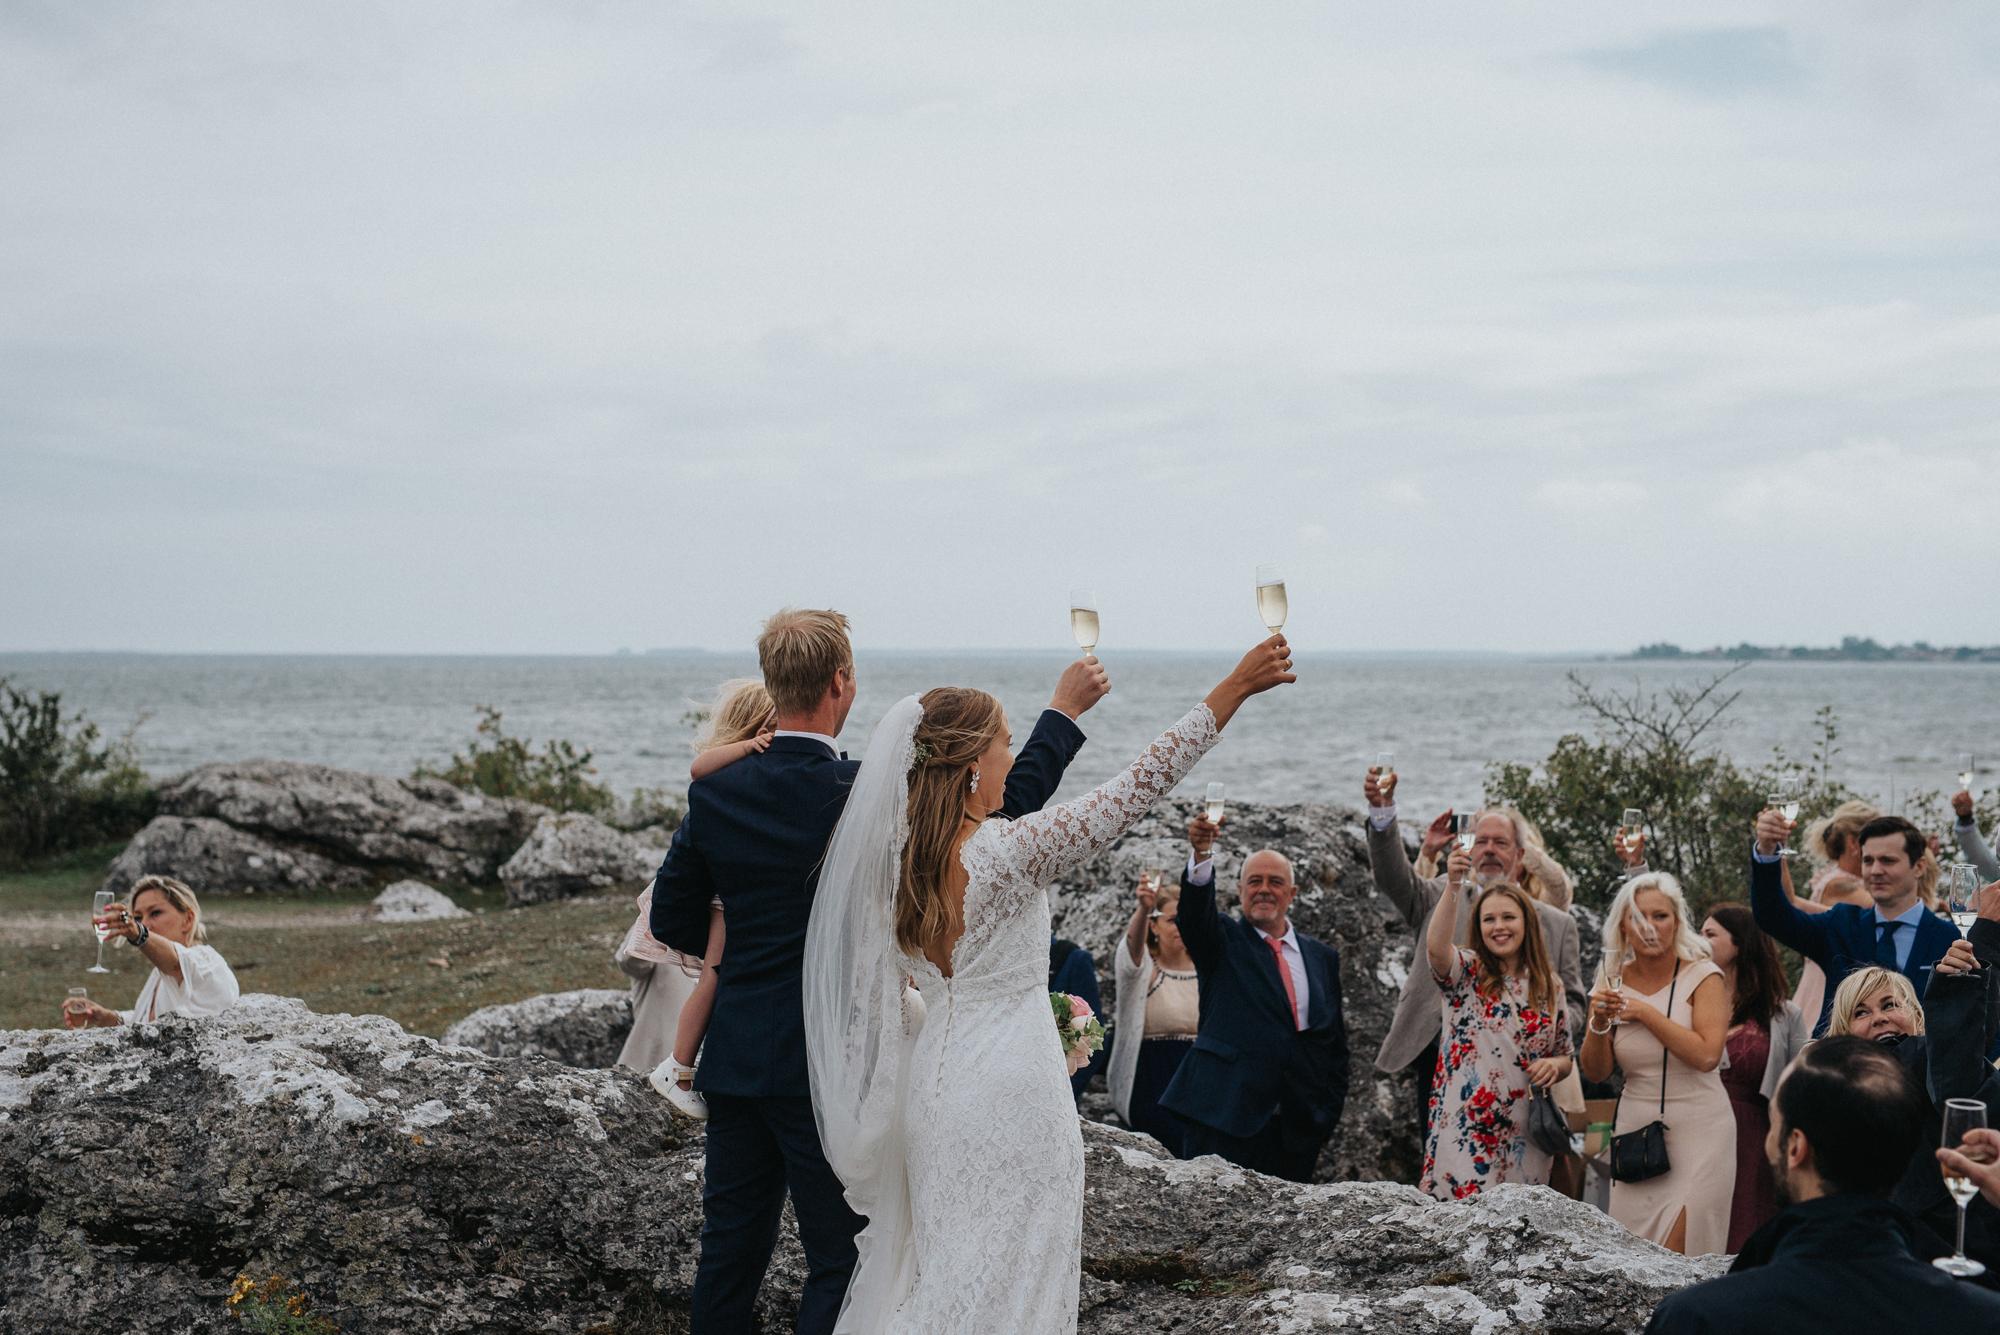 041-bröllopsfotograf-folhammar-gotland-neas-fotografi.jpg